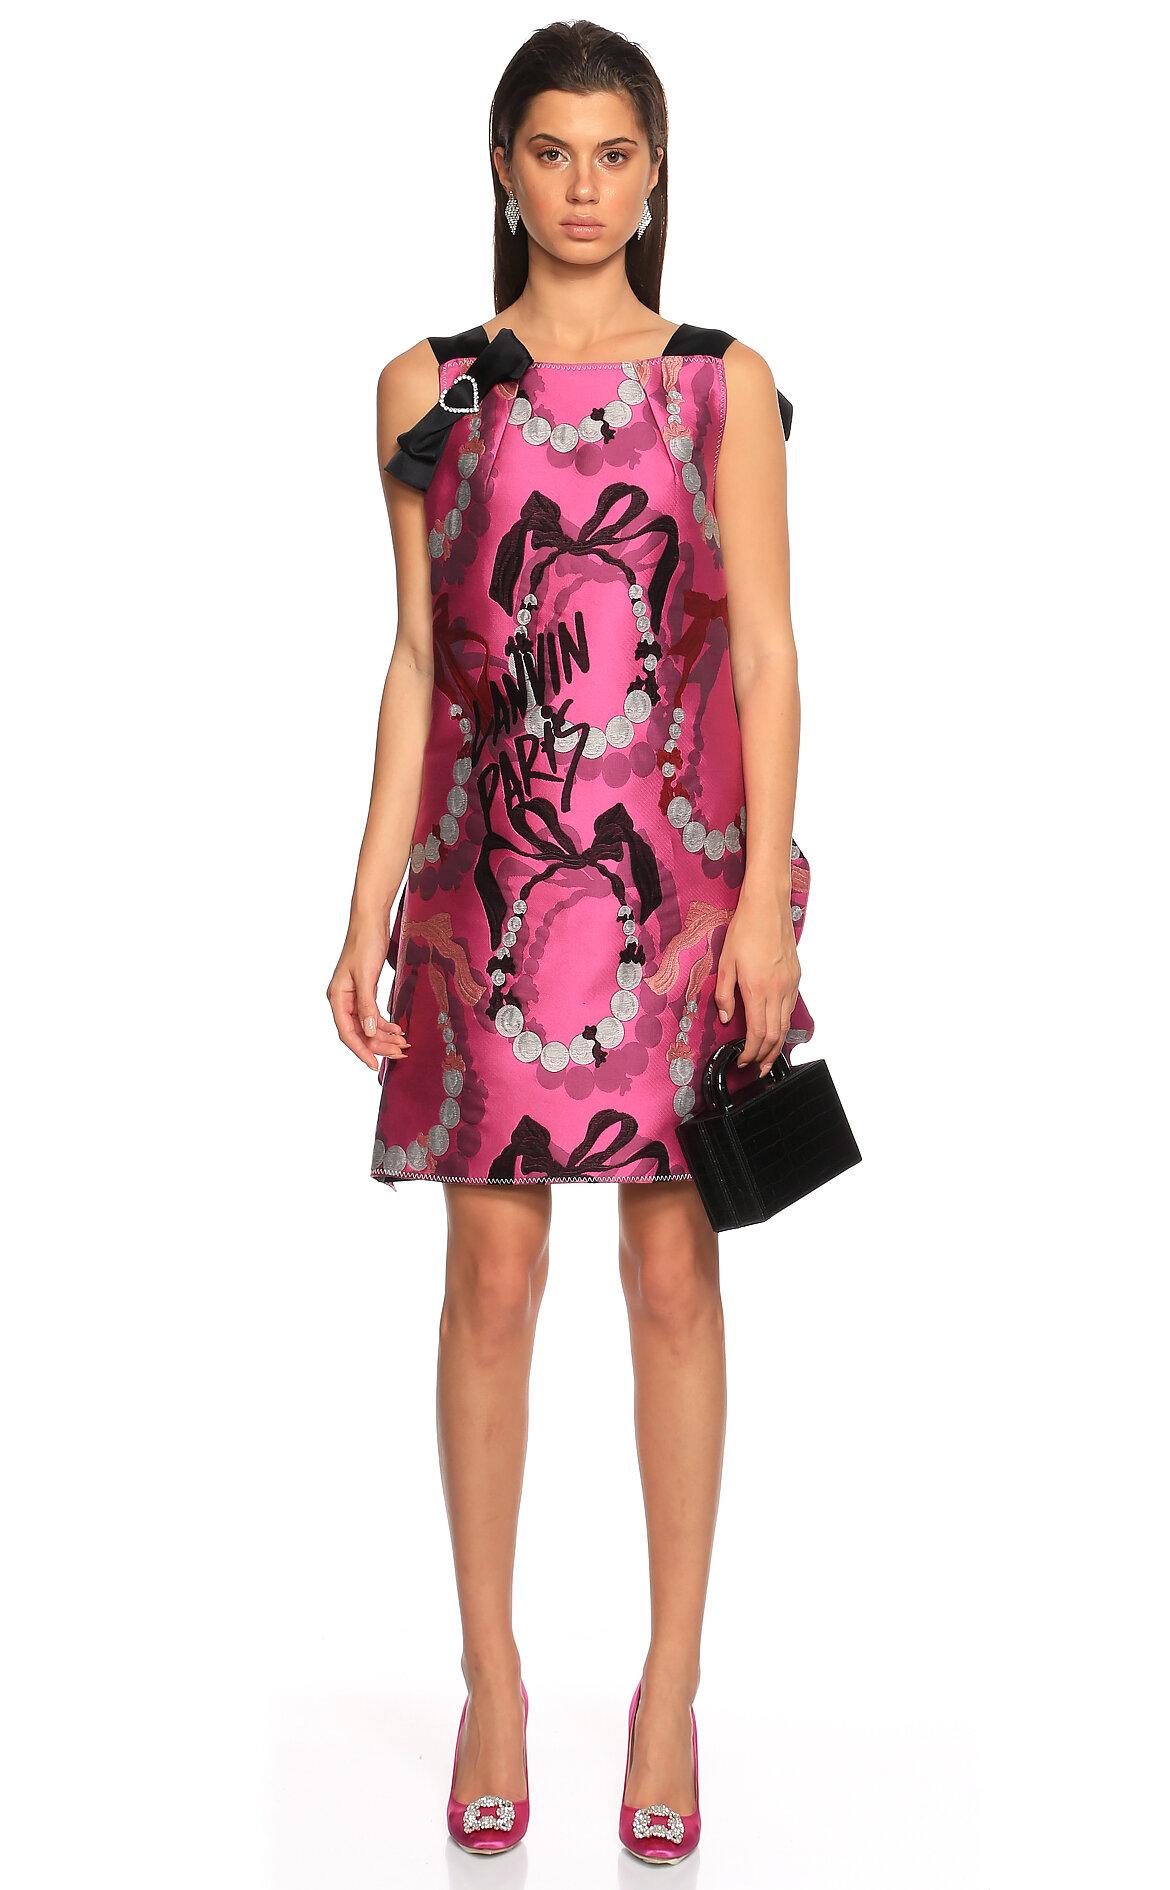 Lanvin-Lanvin İşleme Detaylı Fuşya Mini Elbise